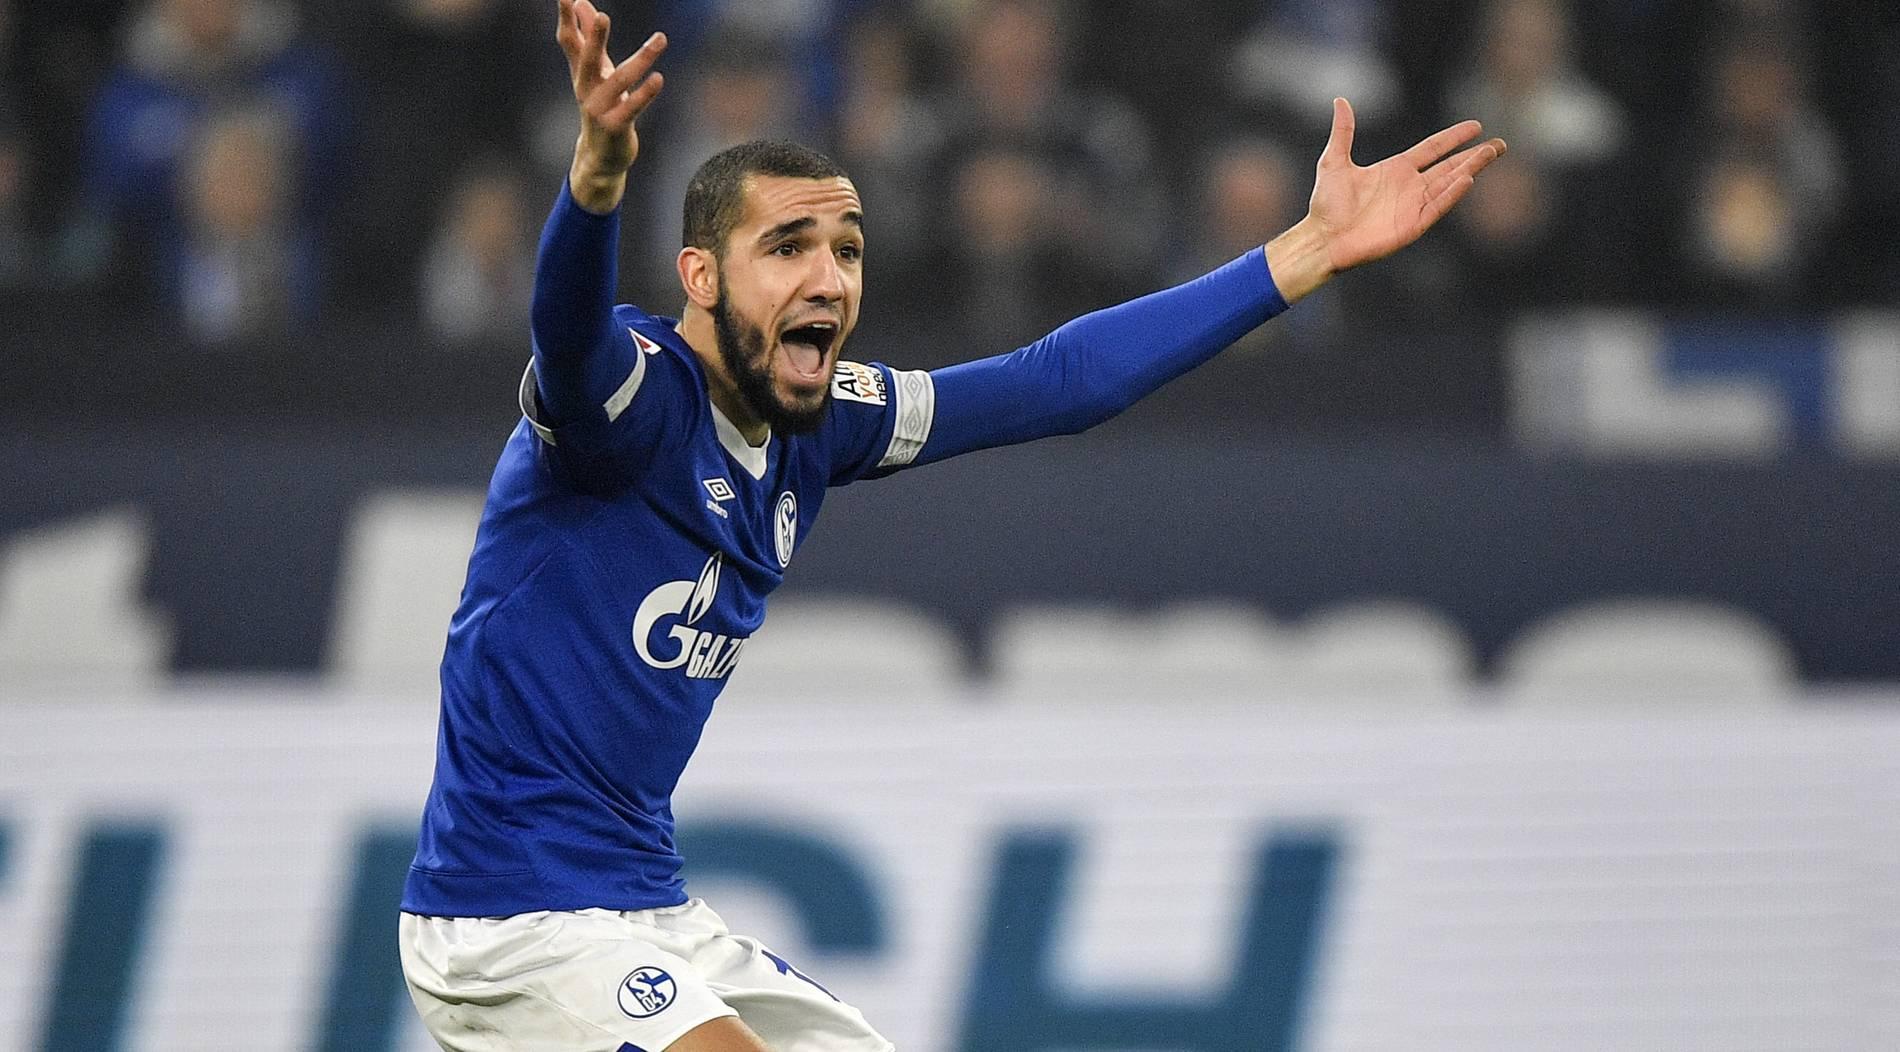 Schalke-Profi Bentaleb erneut in U23 strafversetzt